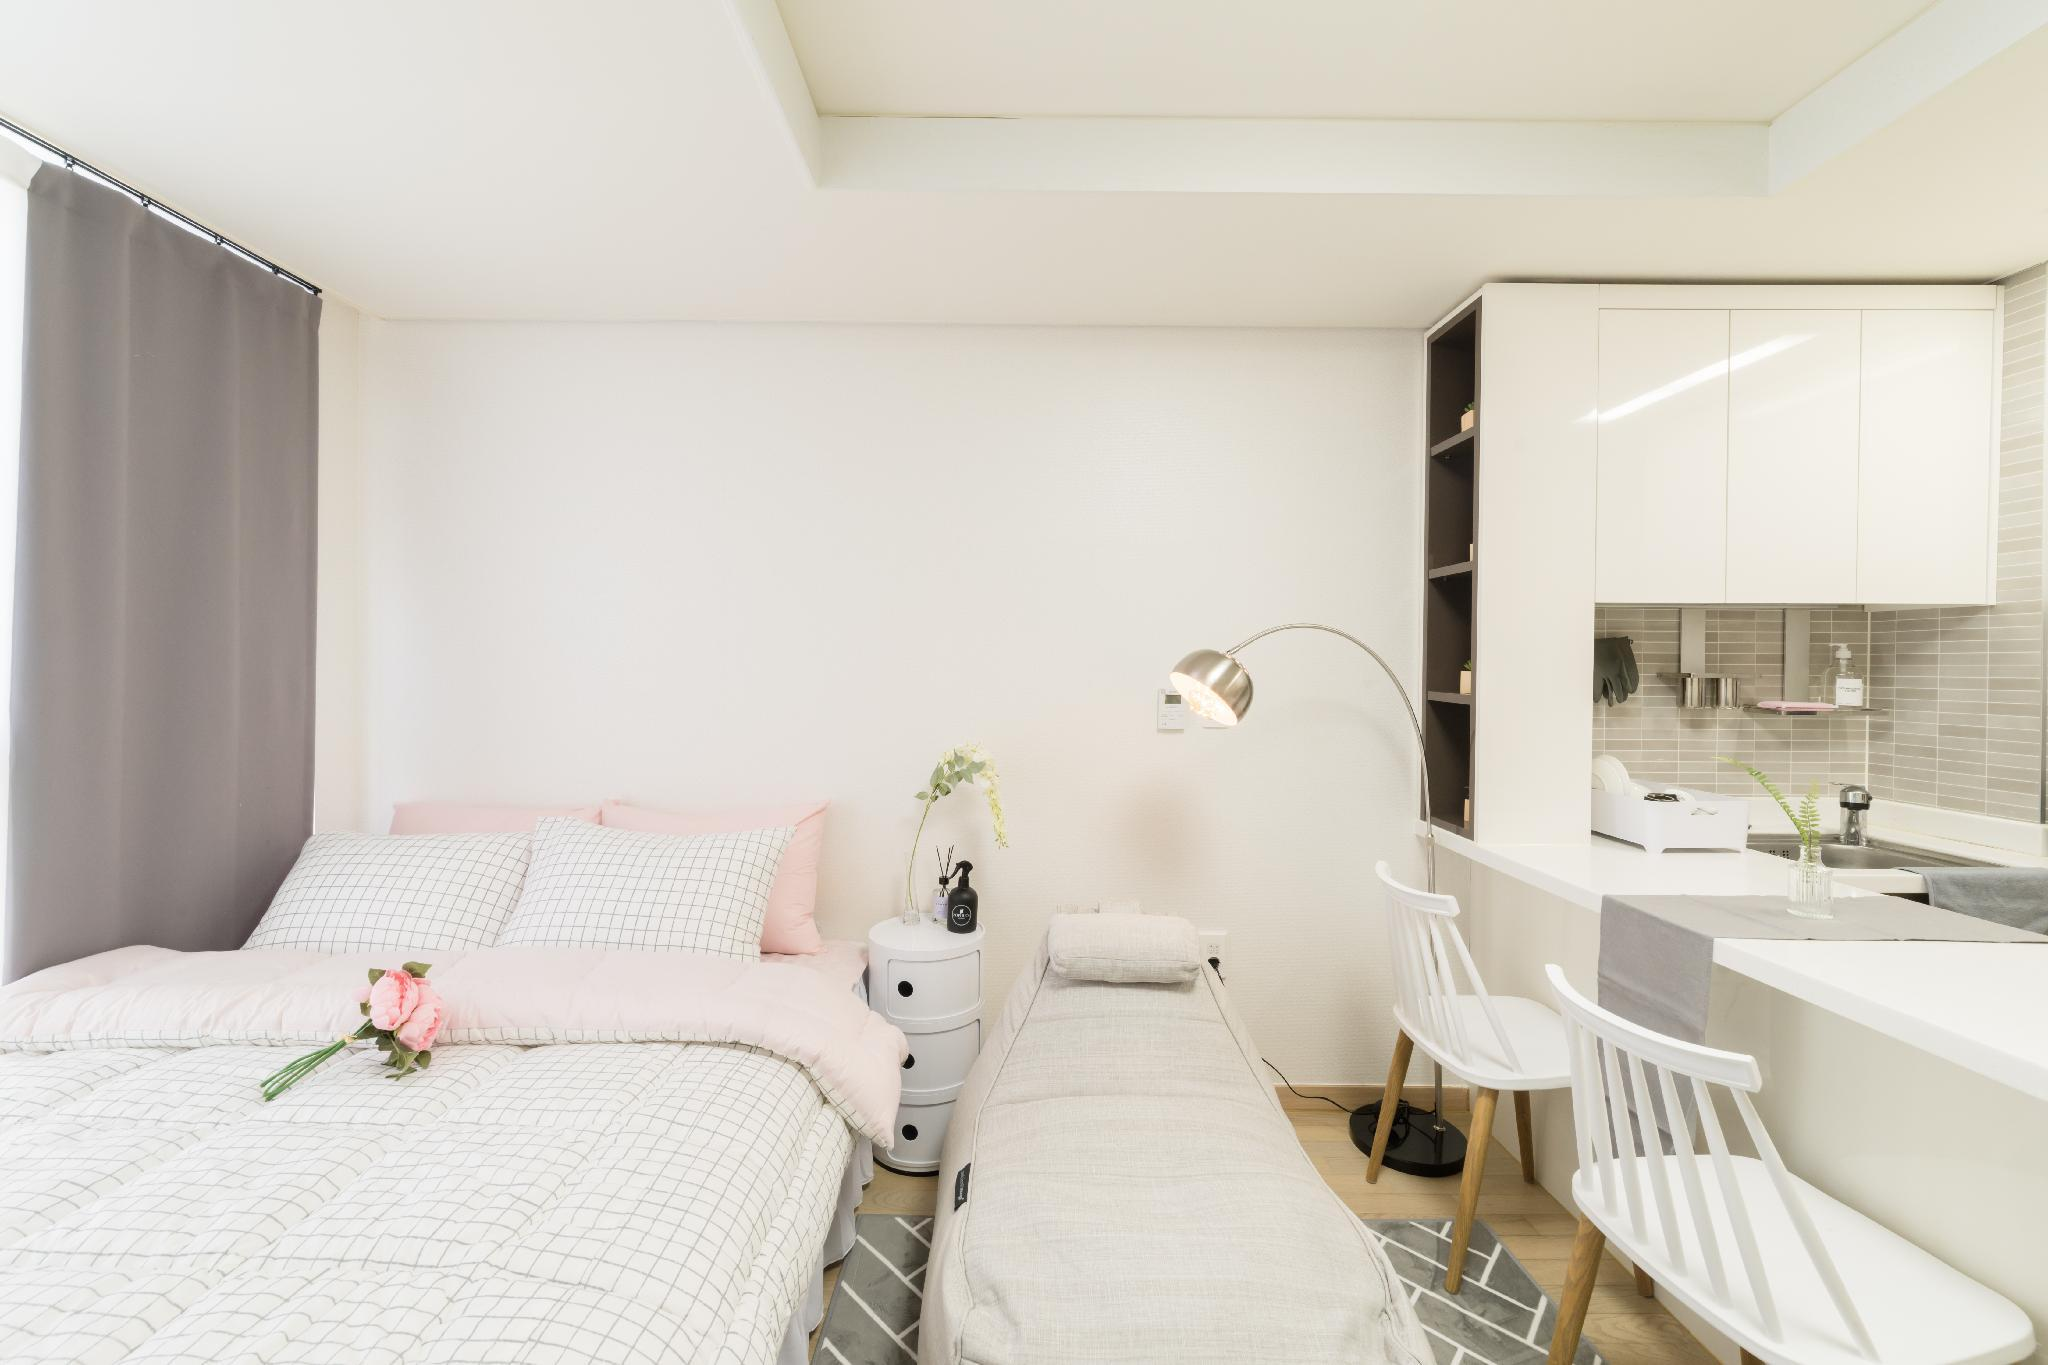 +55 Comfortable Private And Cozy Room    SUB 3min